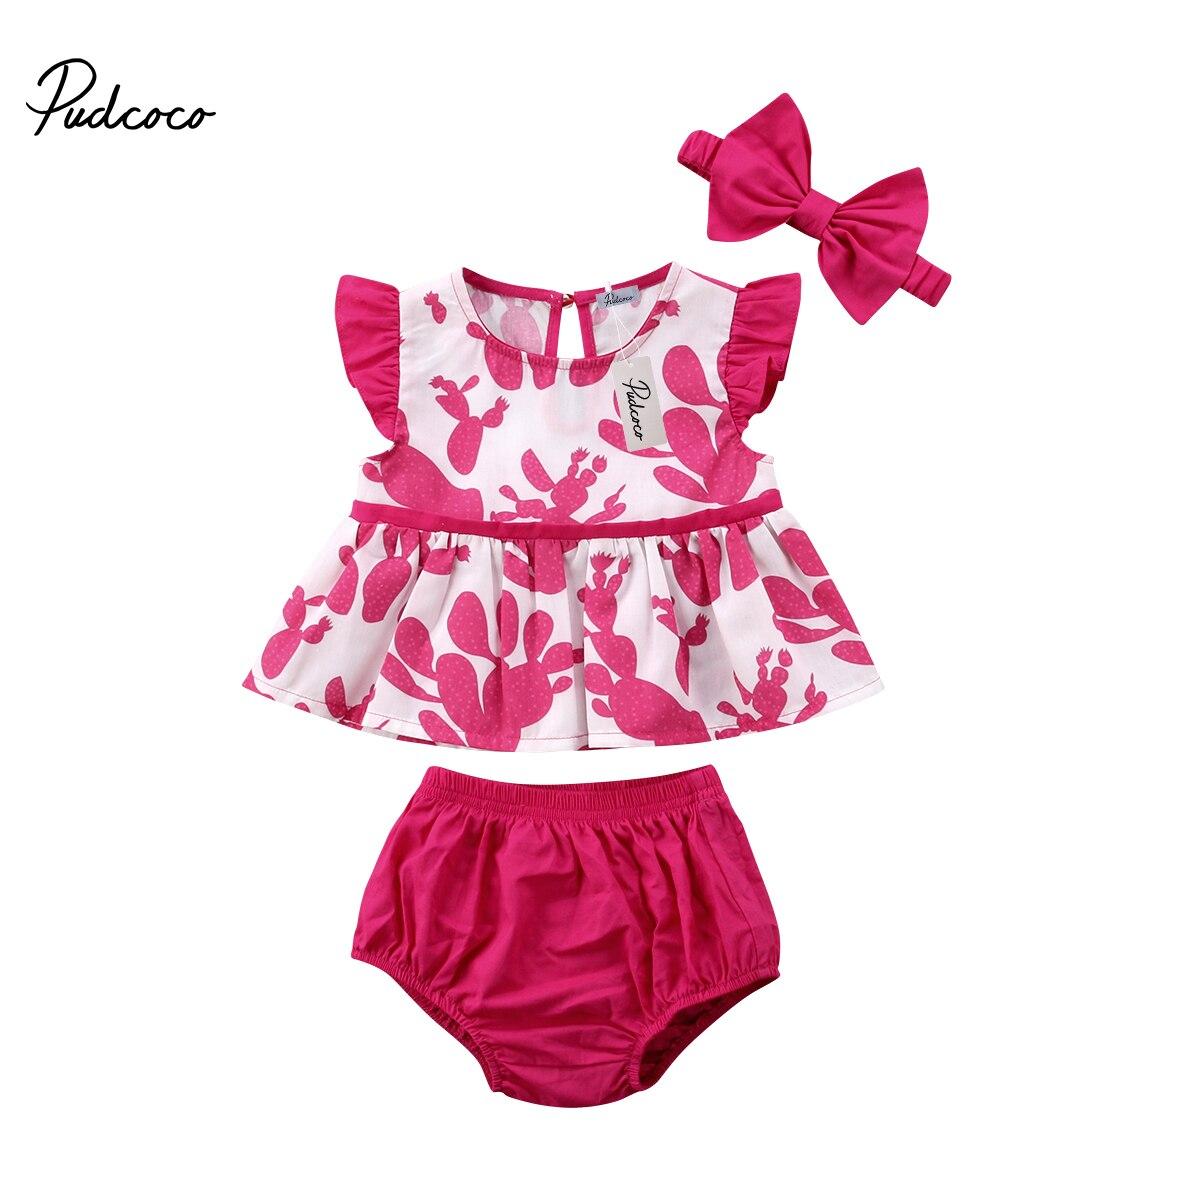 Newborn Baby Girl Clothes Sleeveless Cactus Print Tops Shorts Pants Handband Outfits Summer Infant Clothing 3pcs